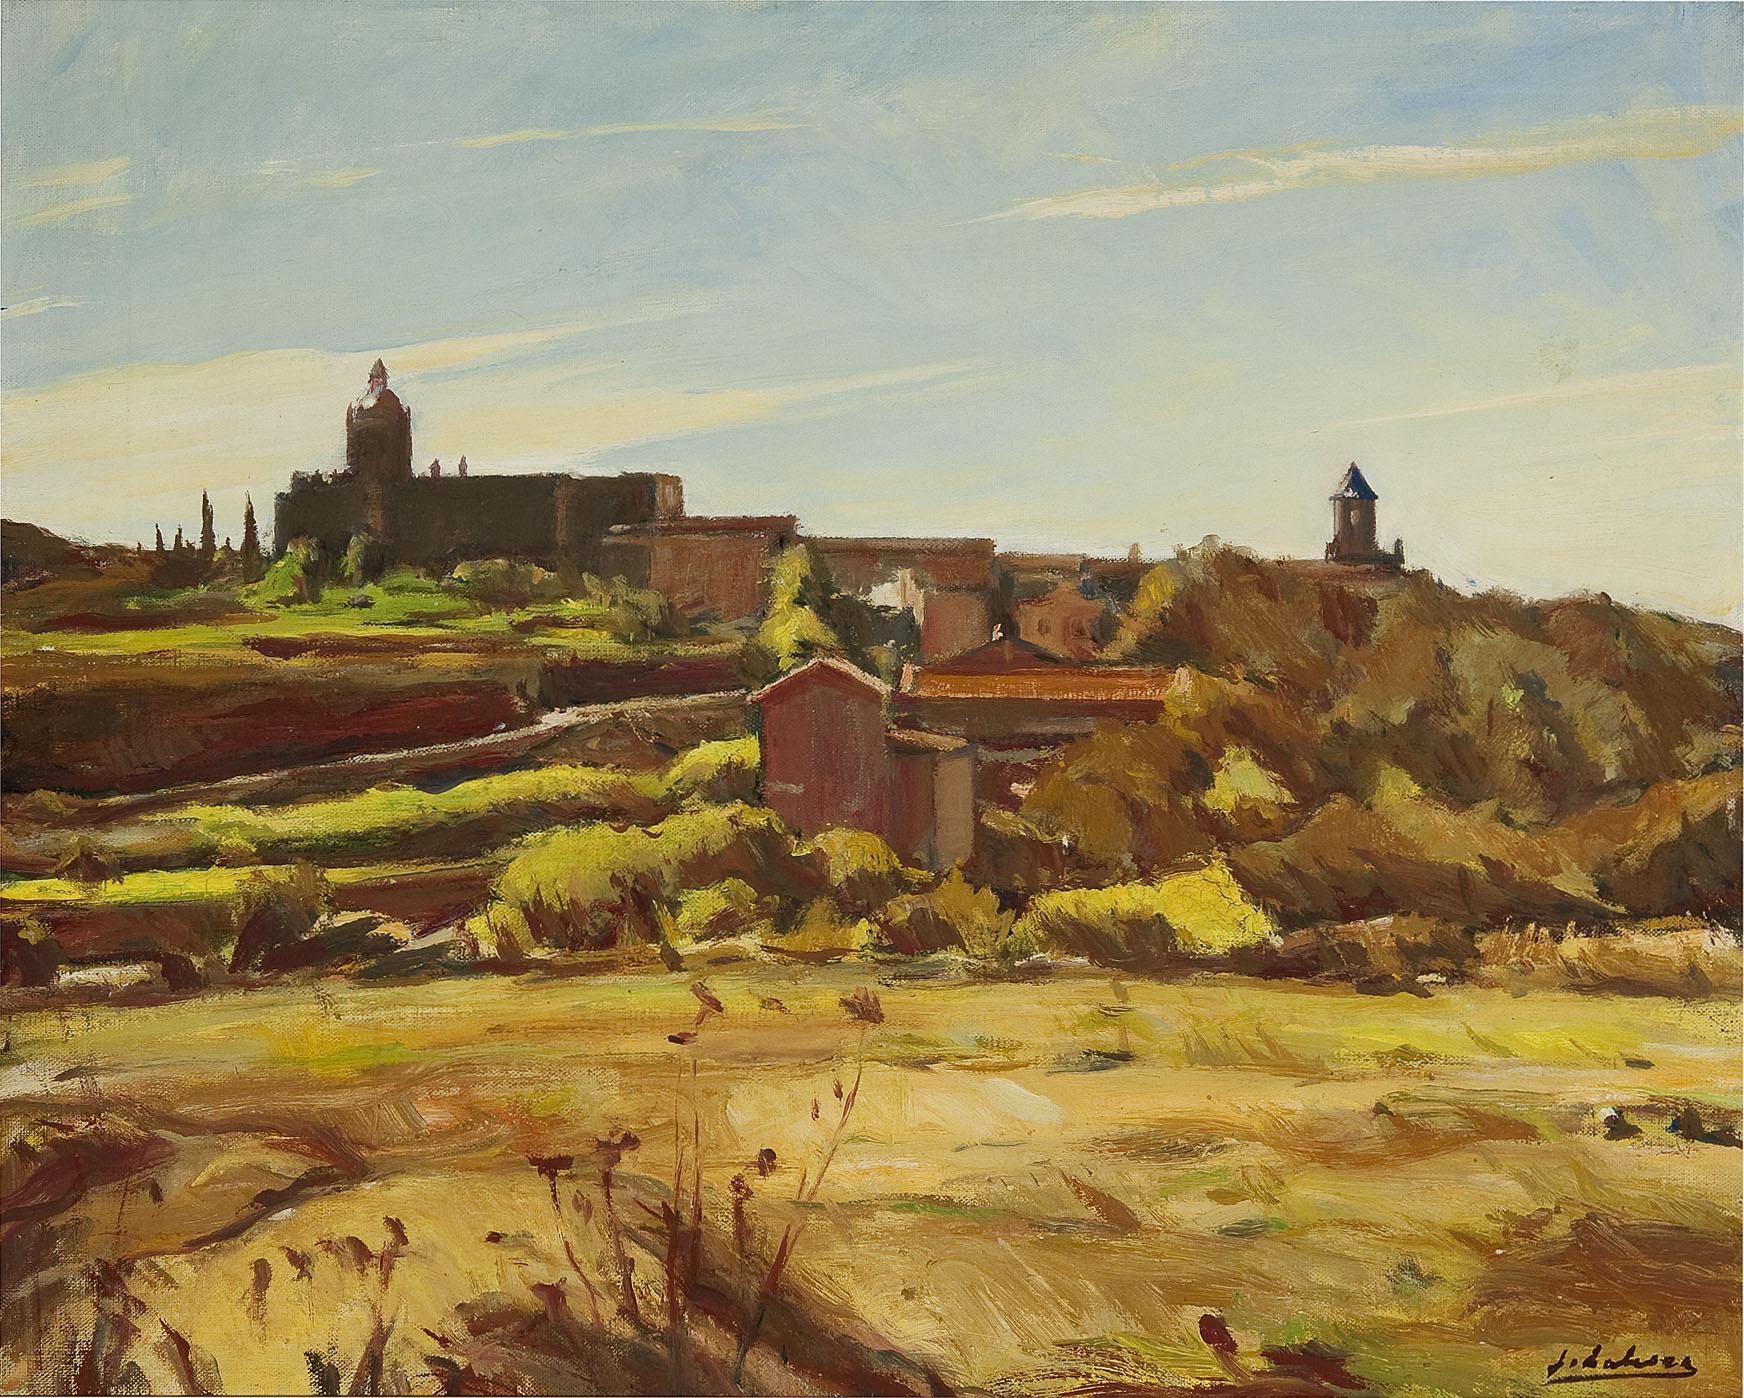 Paisatge rural | Lahosa Valimaña, Joan